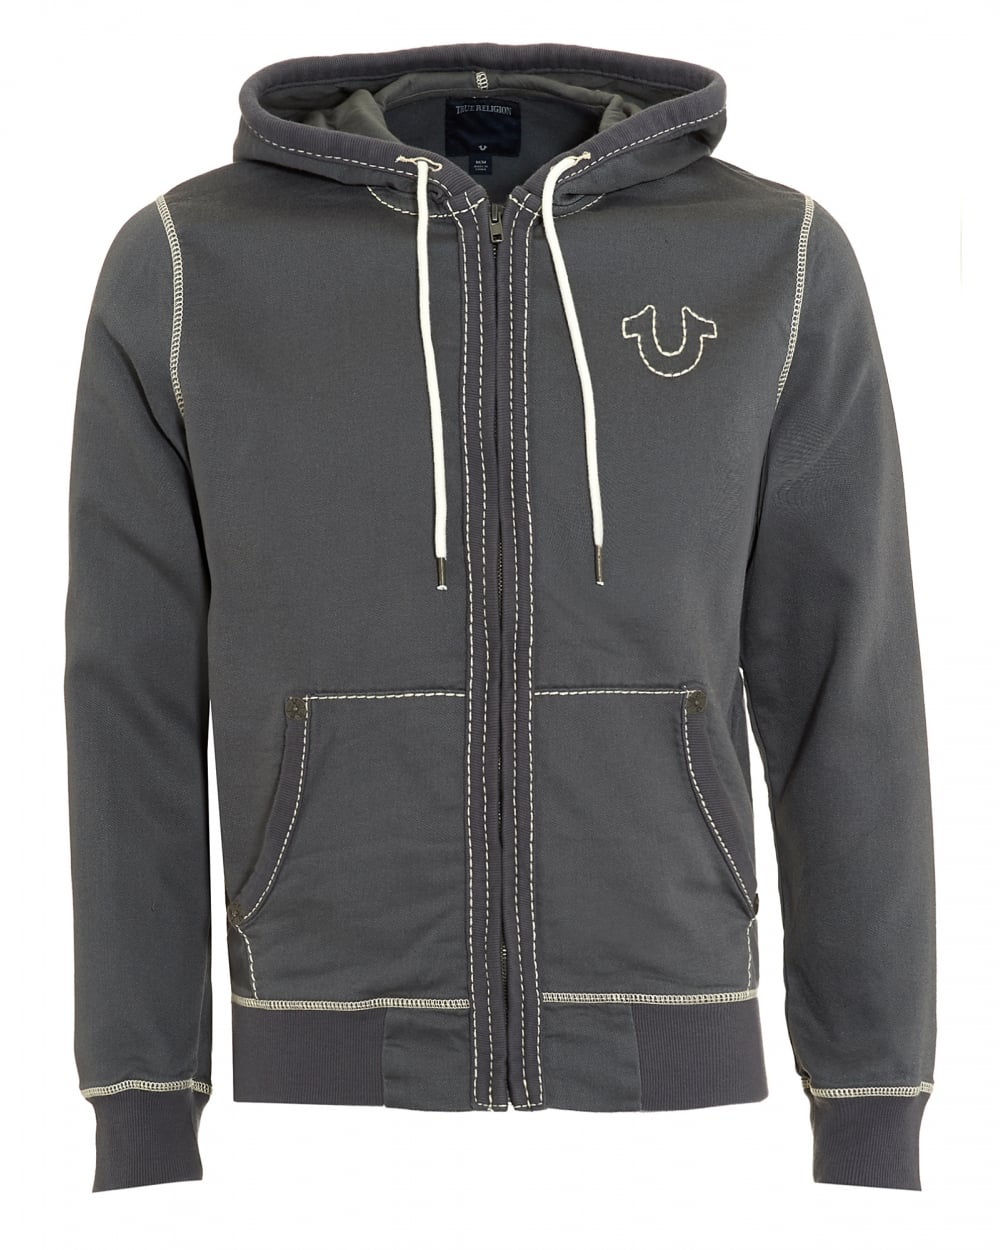 True religion hoodie sale